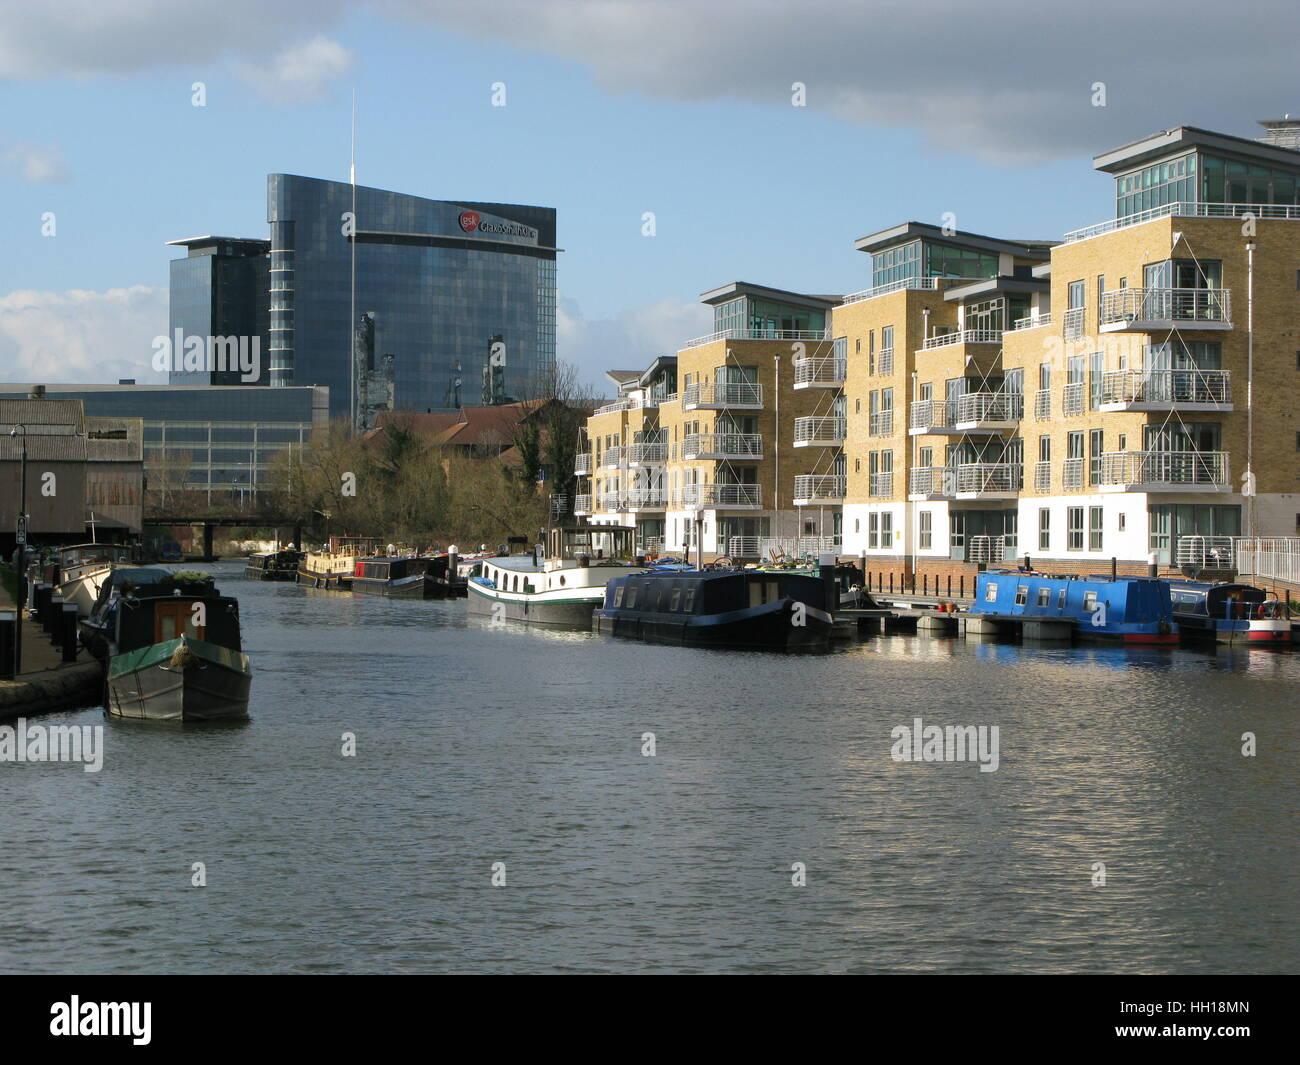 London, United Kingdom - March 4, 2008: Brentford Marina, River Brent, Greater London, Brentford, England, United - Stock Image